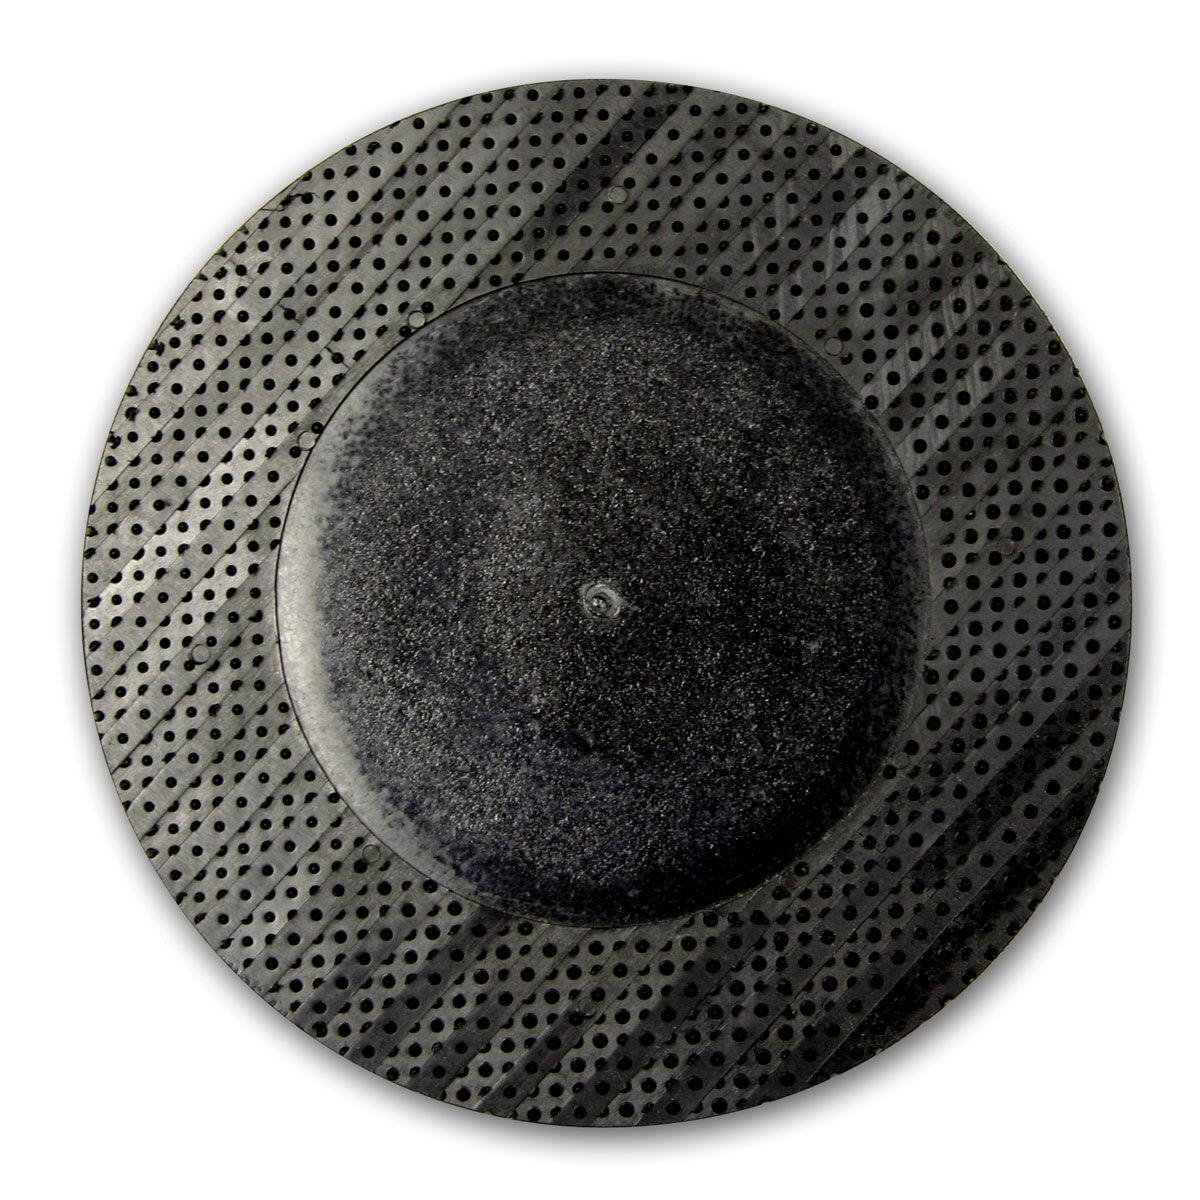 Orbiter Drive Pad Block